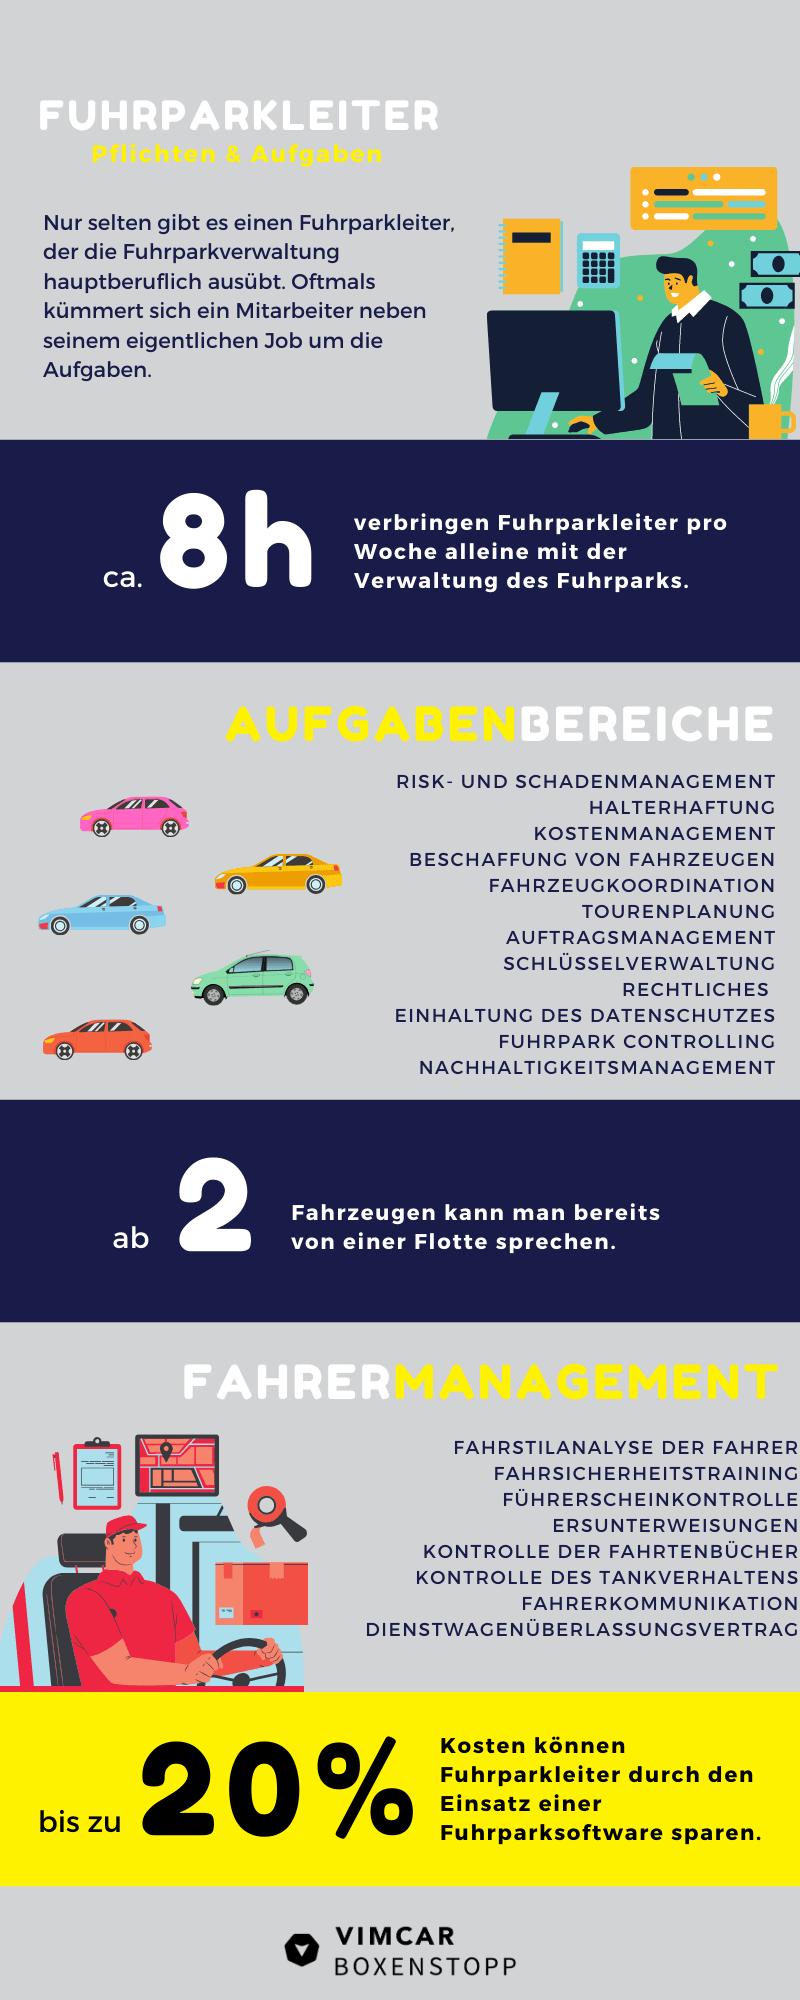 Infografik zum Fuhrparkmanagement